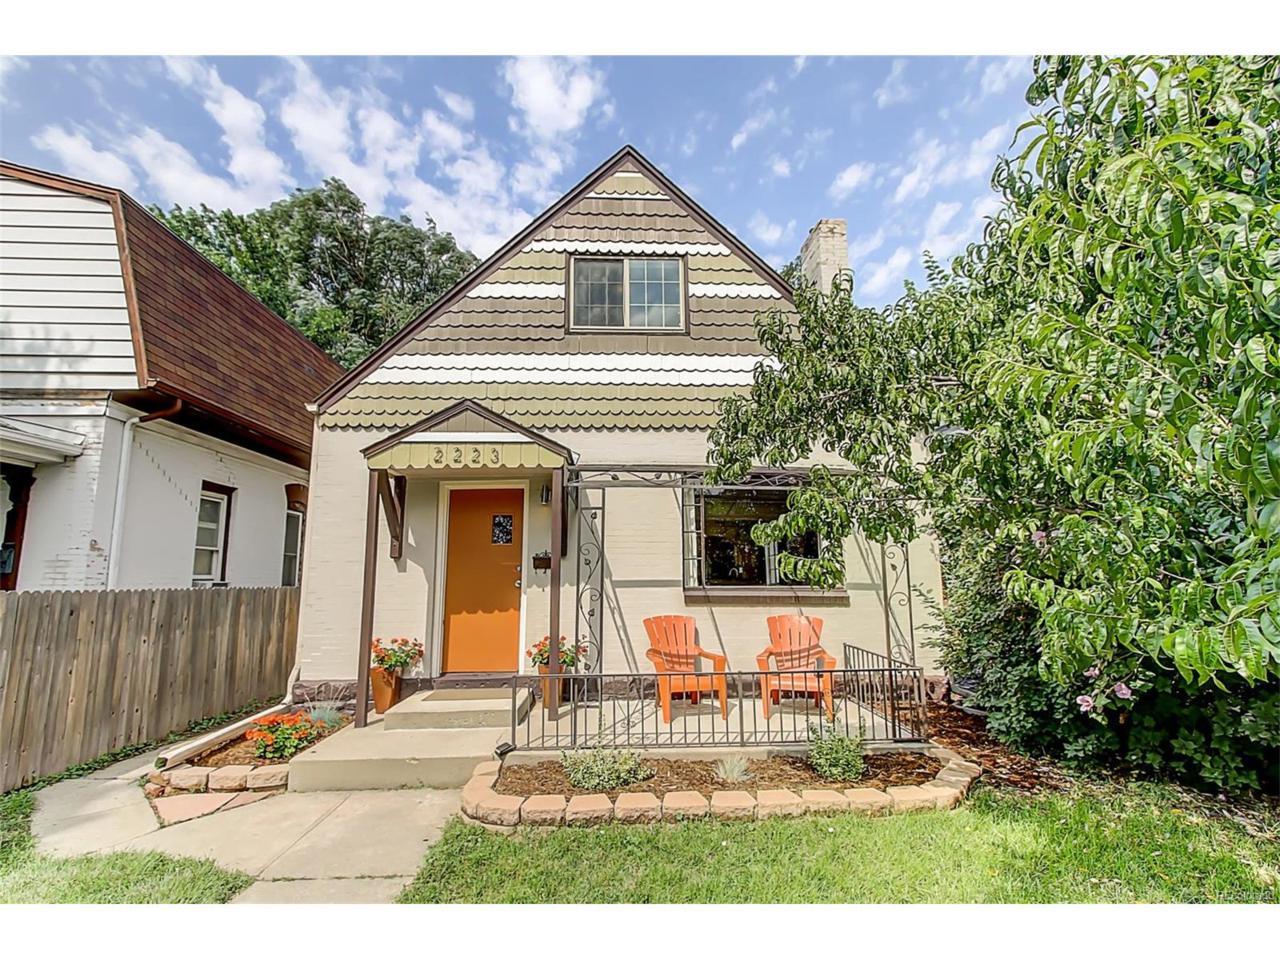 2223 Irving Street, Denver, CO 80211 (MLS #5392200) :: 8z Real Estate